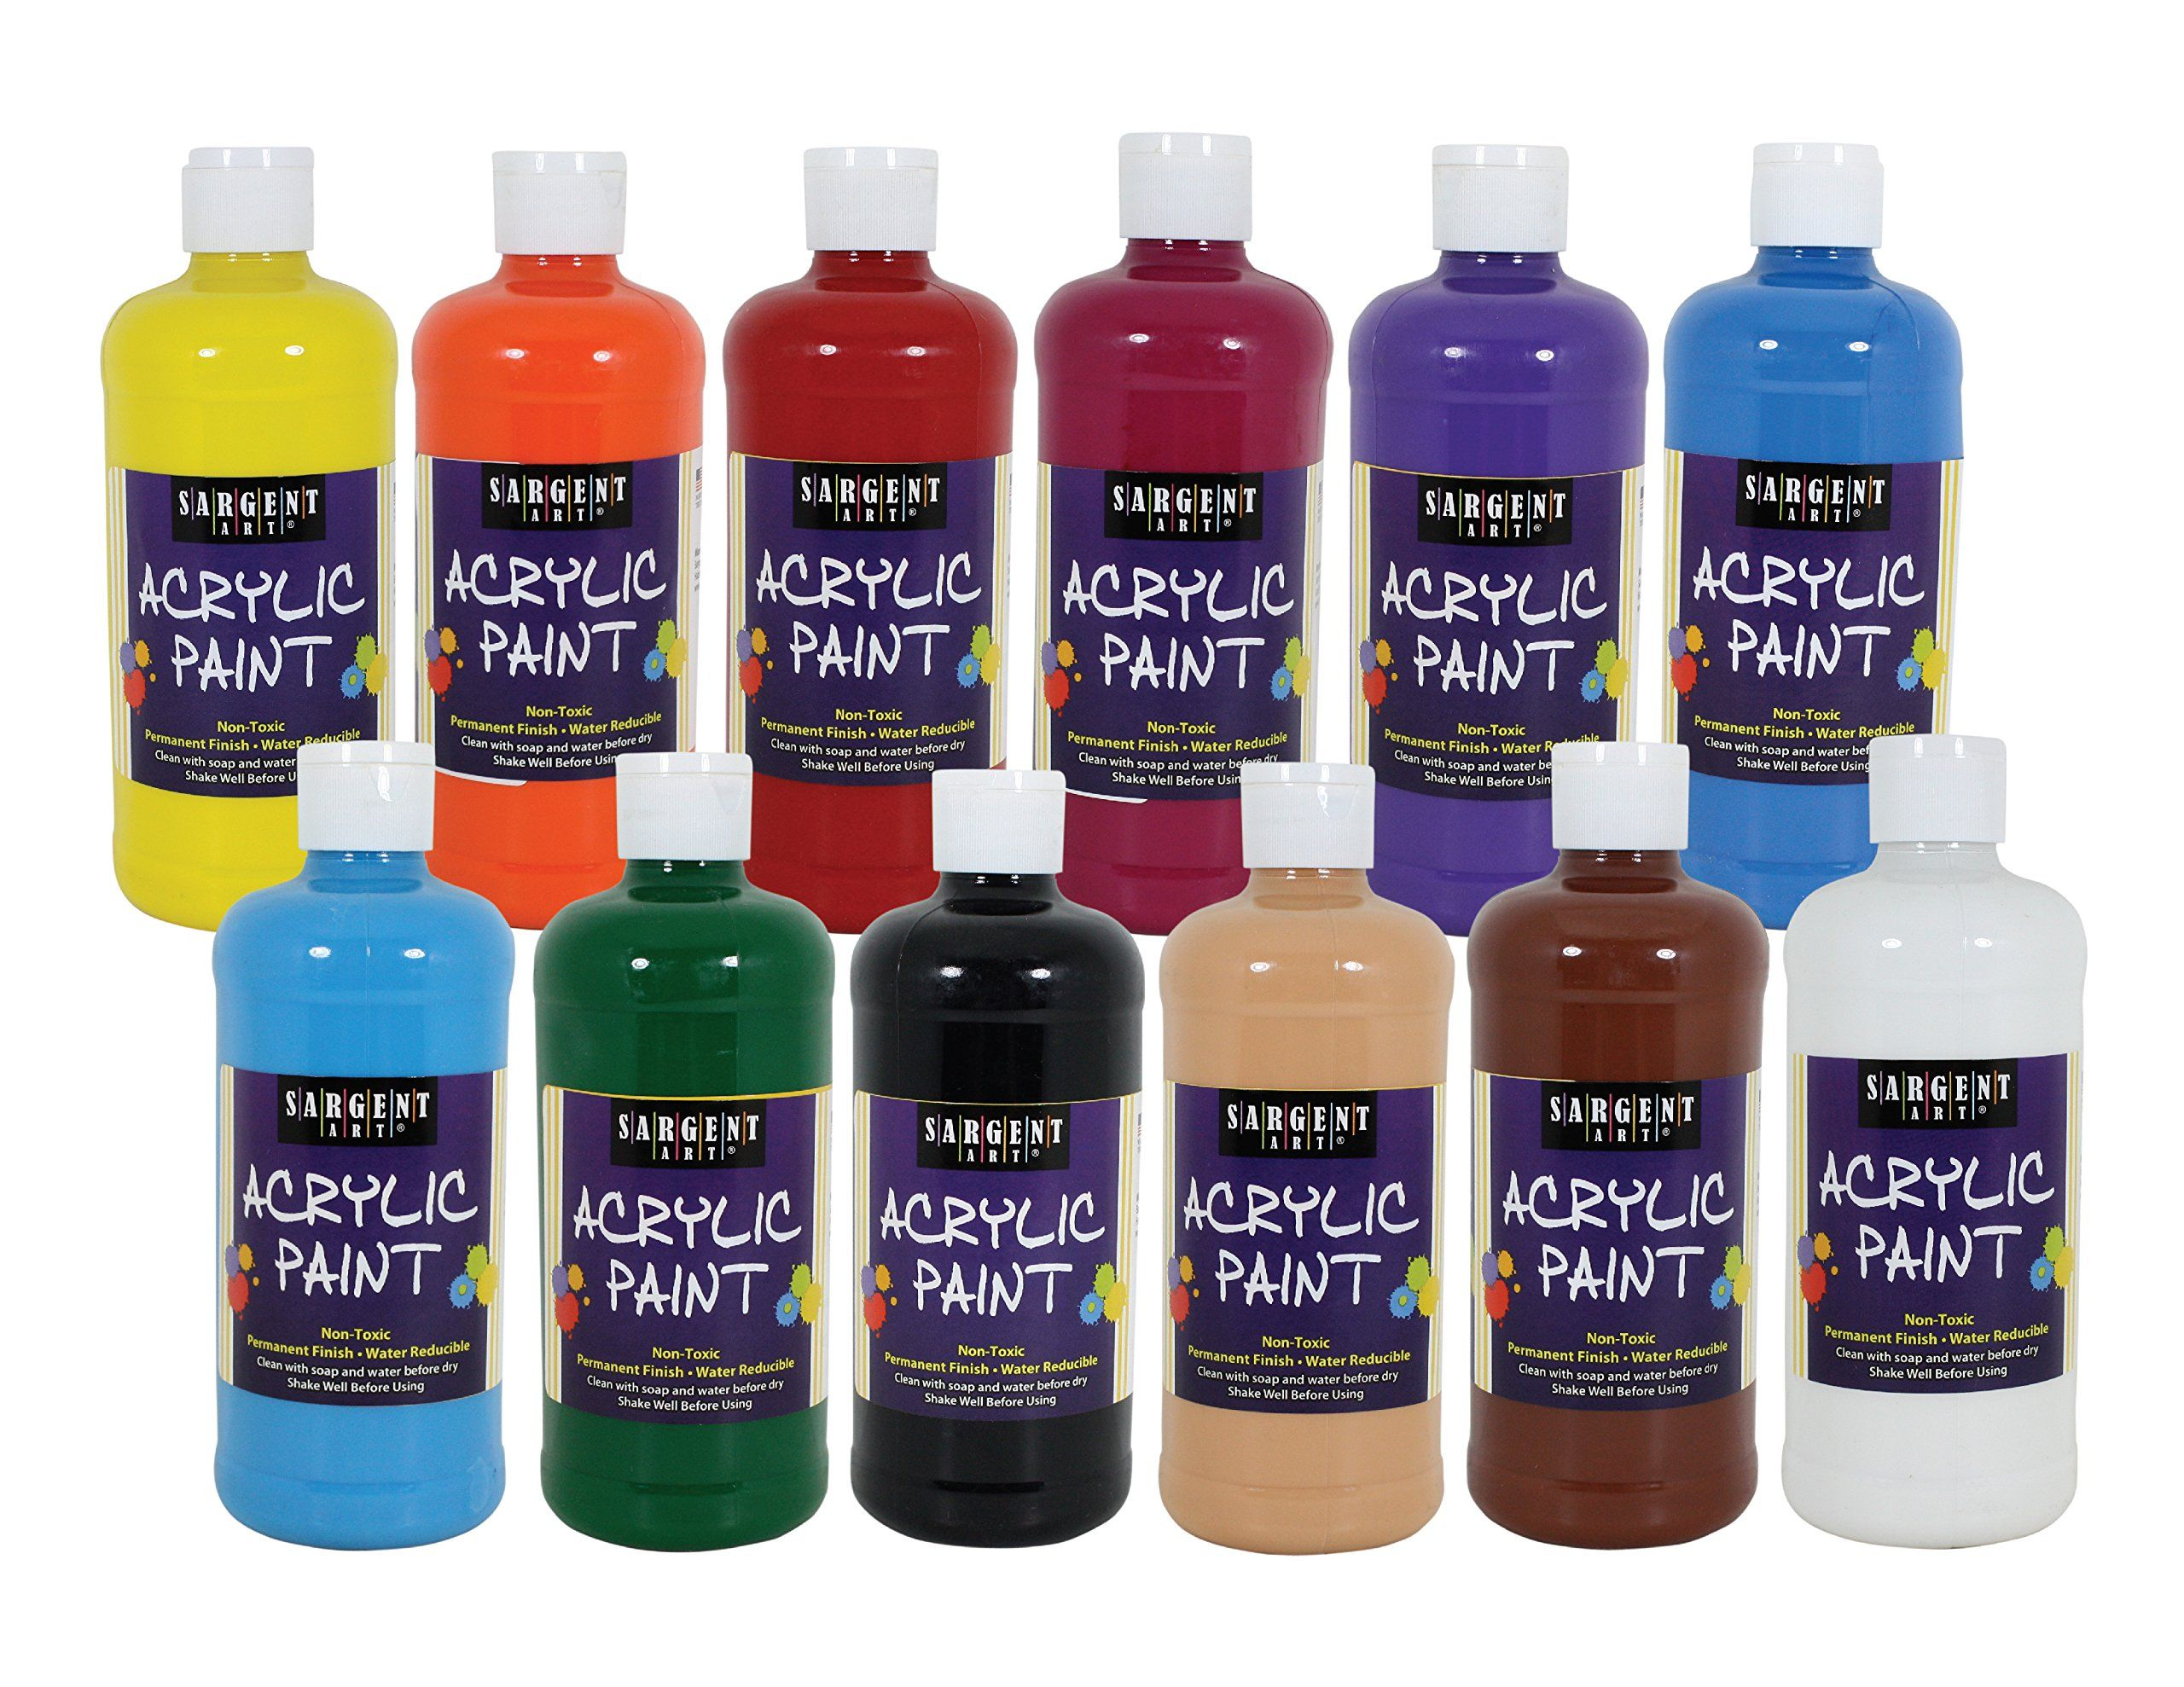 Sargent Art 242498 12count Artist Quality Acrylic Paint Set 12 Different Colors You Can Find Out More De Acrylic Paint Set Paint Set Sargent Art